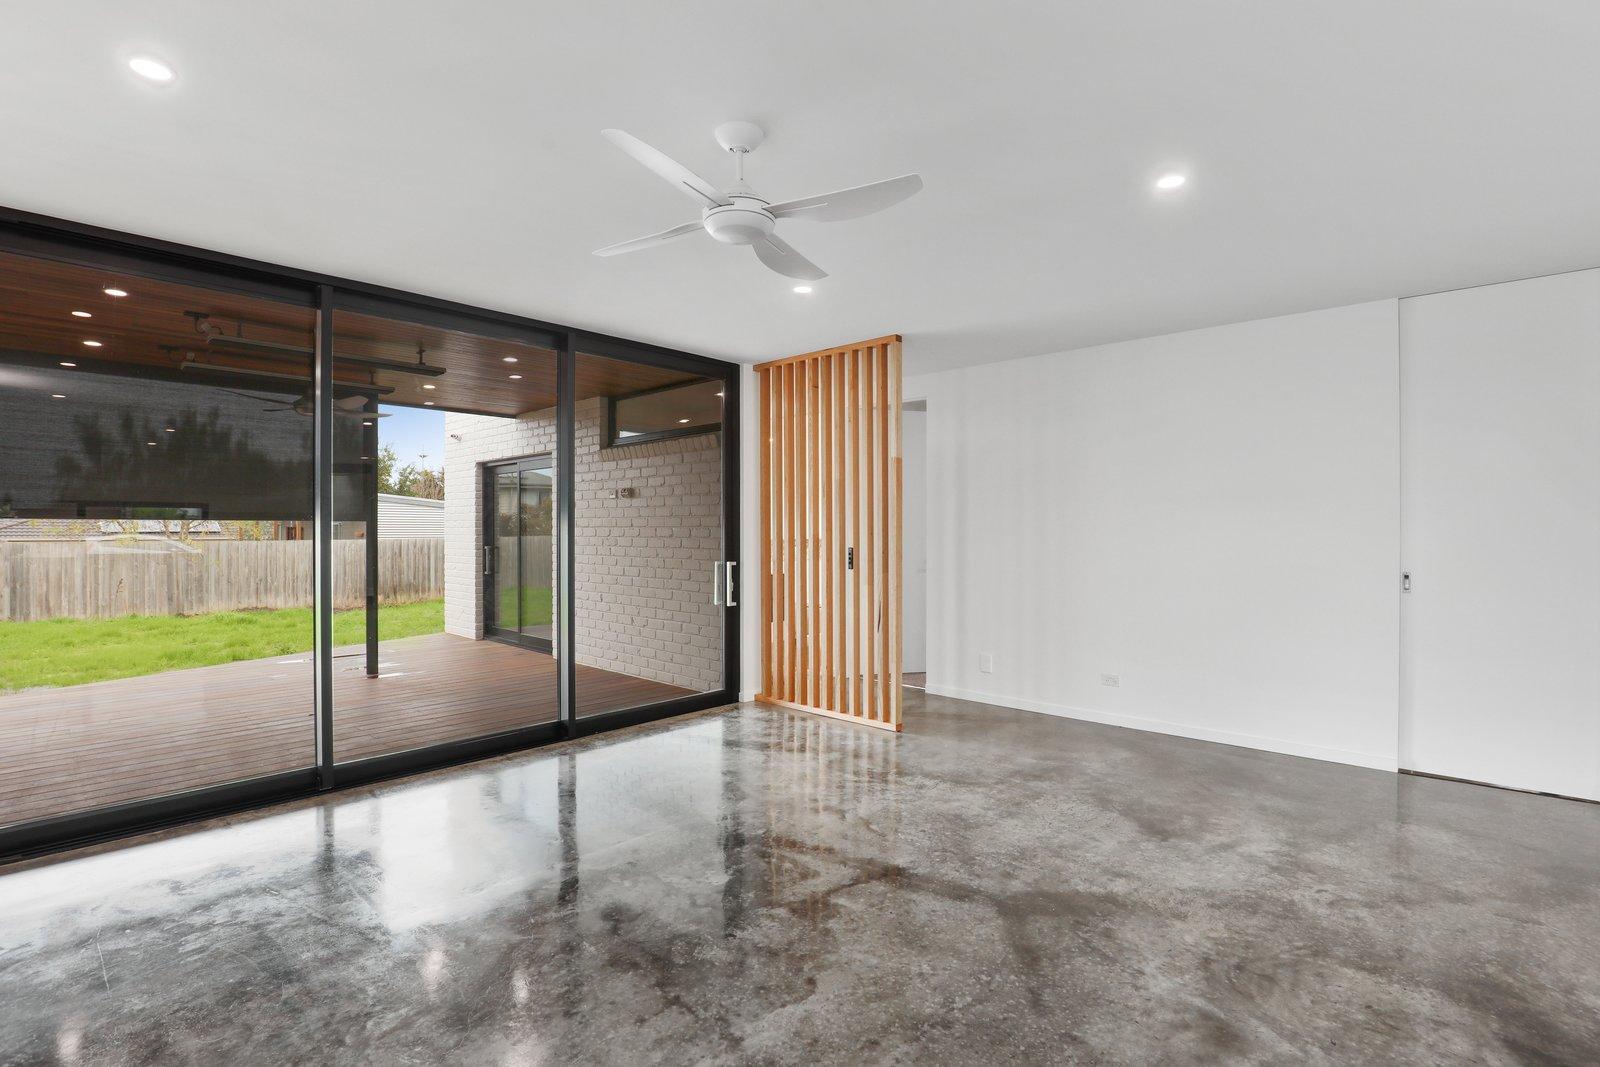 Dining Room, Recessed Lighting, and Concrete Floor  Tamara Crecsent by Inverloch 3996